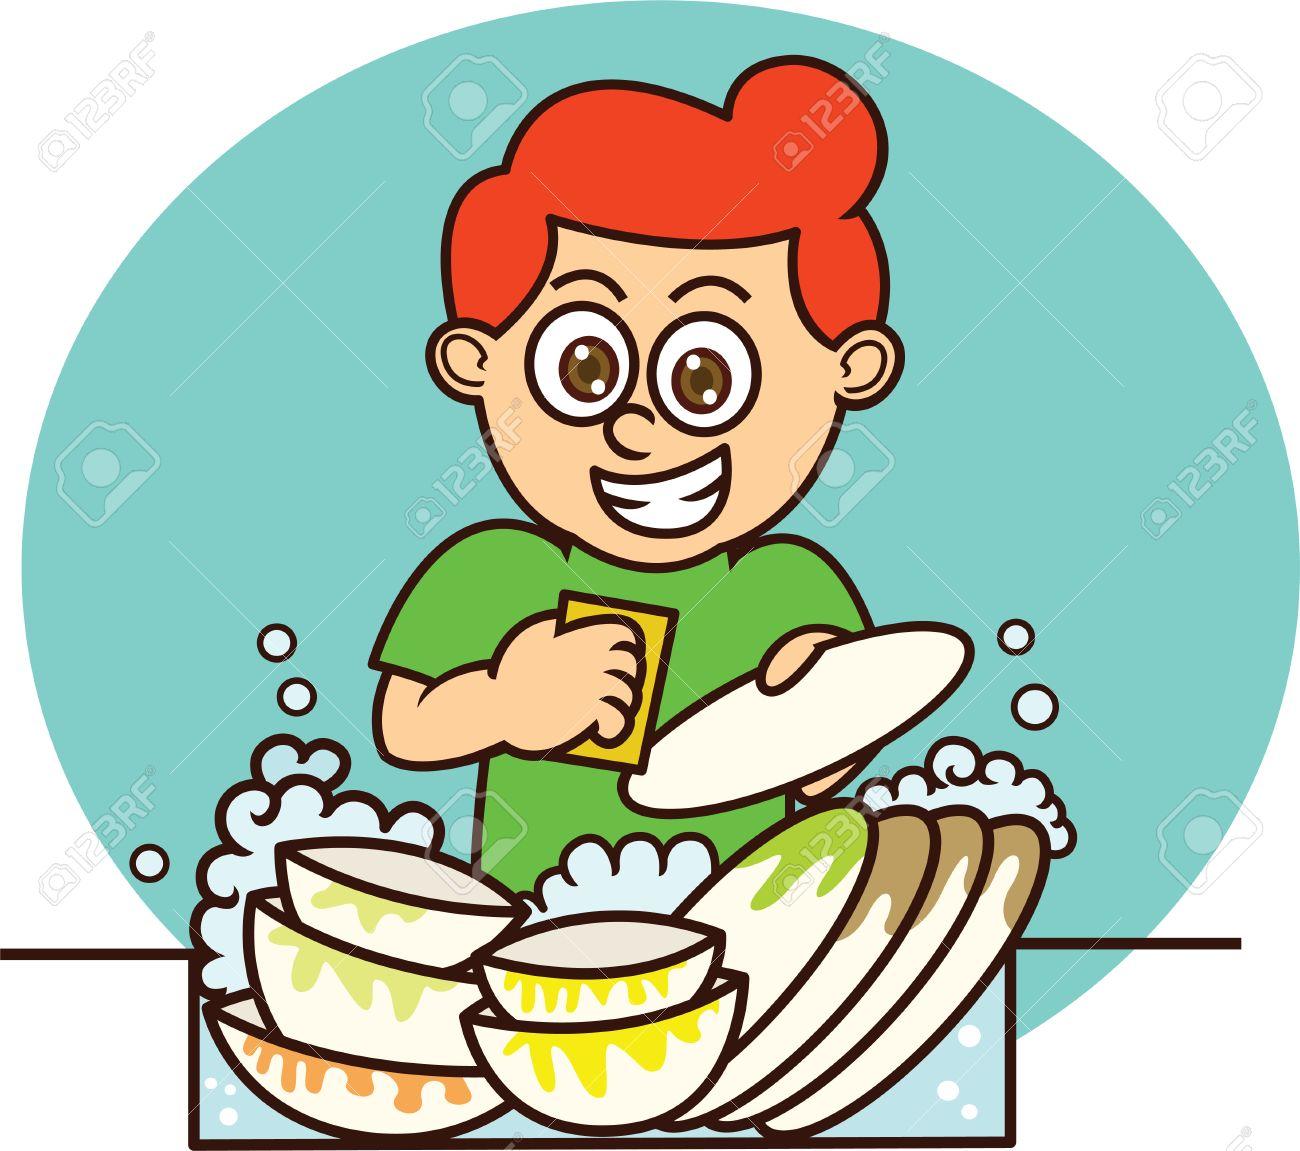 Young Man Washing Dishes Cartoon Illustration on Isolated Background.